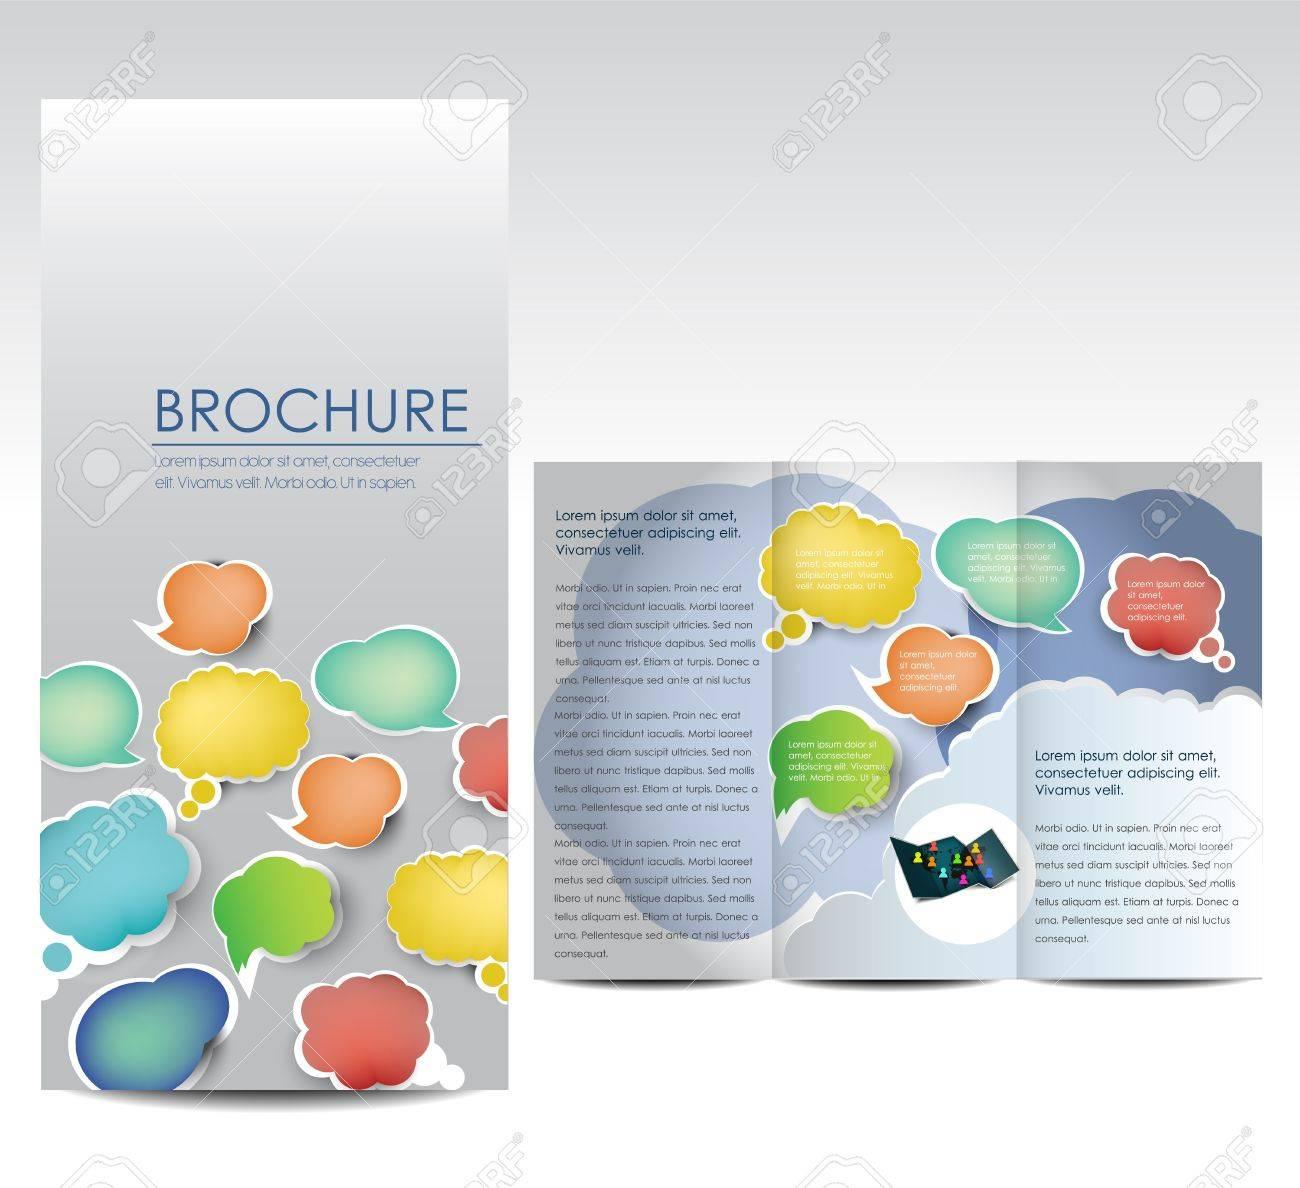 Brochure with speech bubbles Stock Vector - 17356959